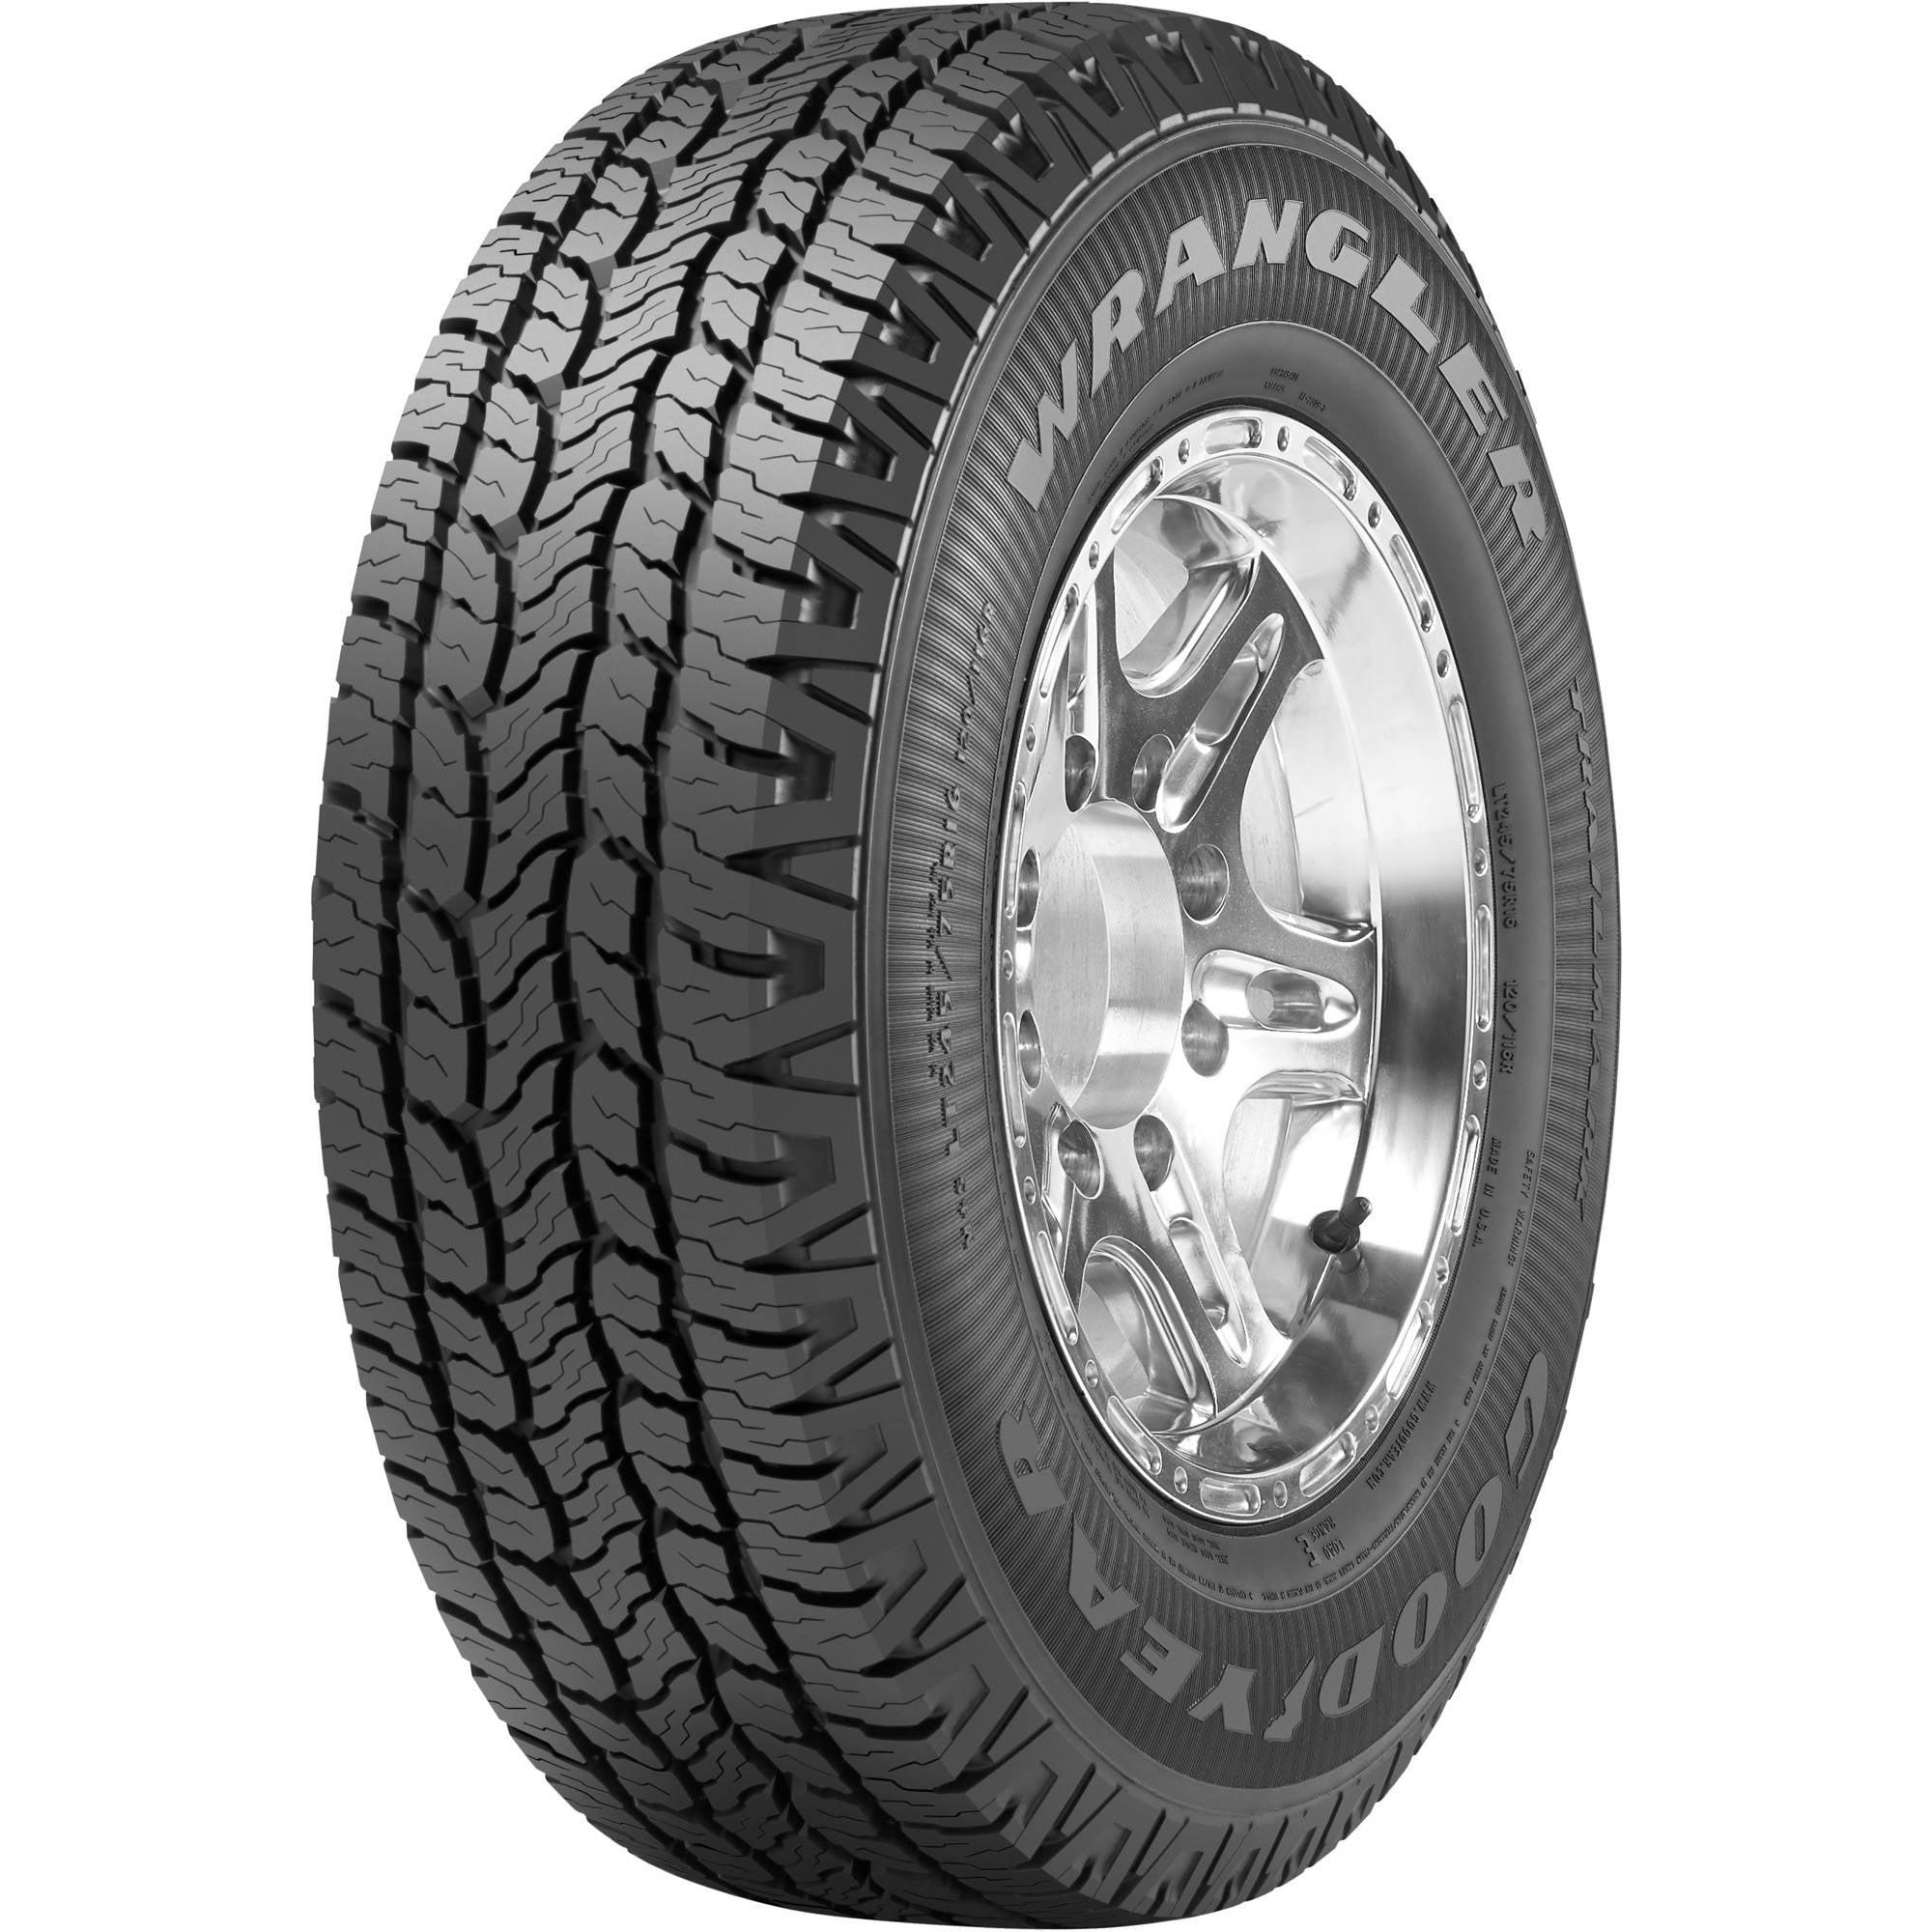 Goodyear Wrangler Trailmark Tire P265/65R18  112T